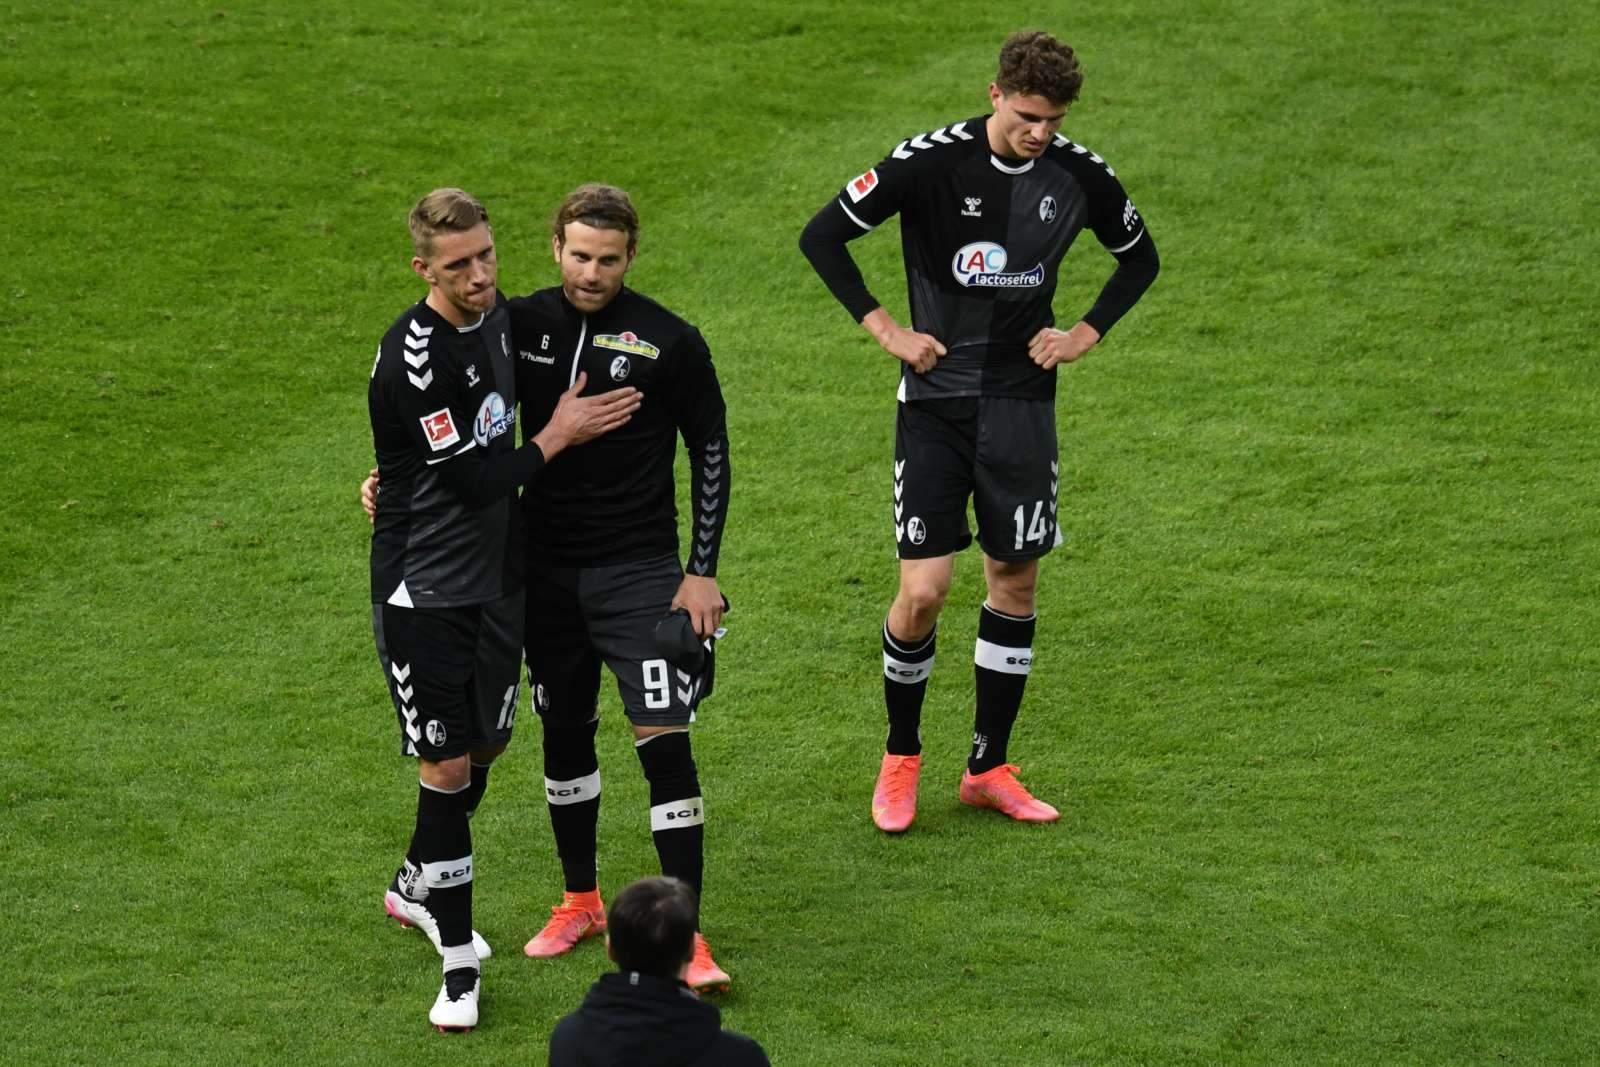 Как «Боруссия» из Дортмунда пропускала от «Фрайбурга» - видео